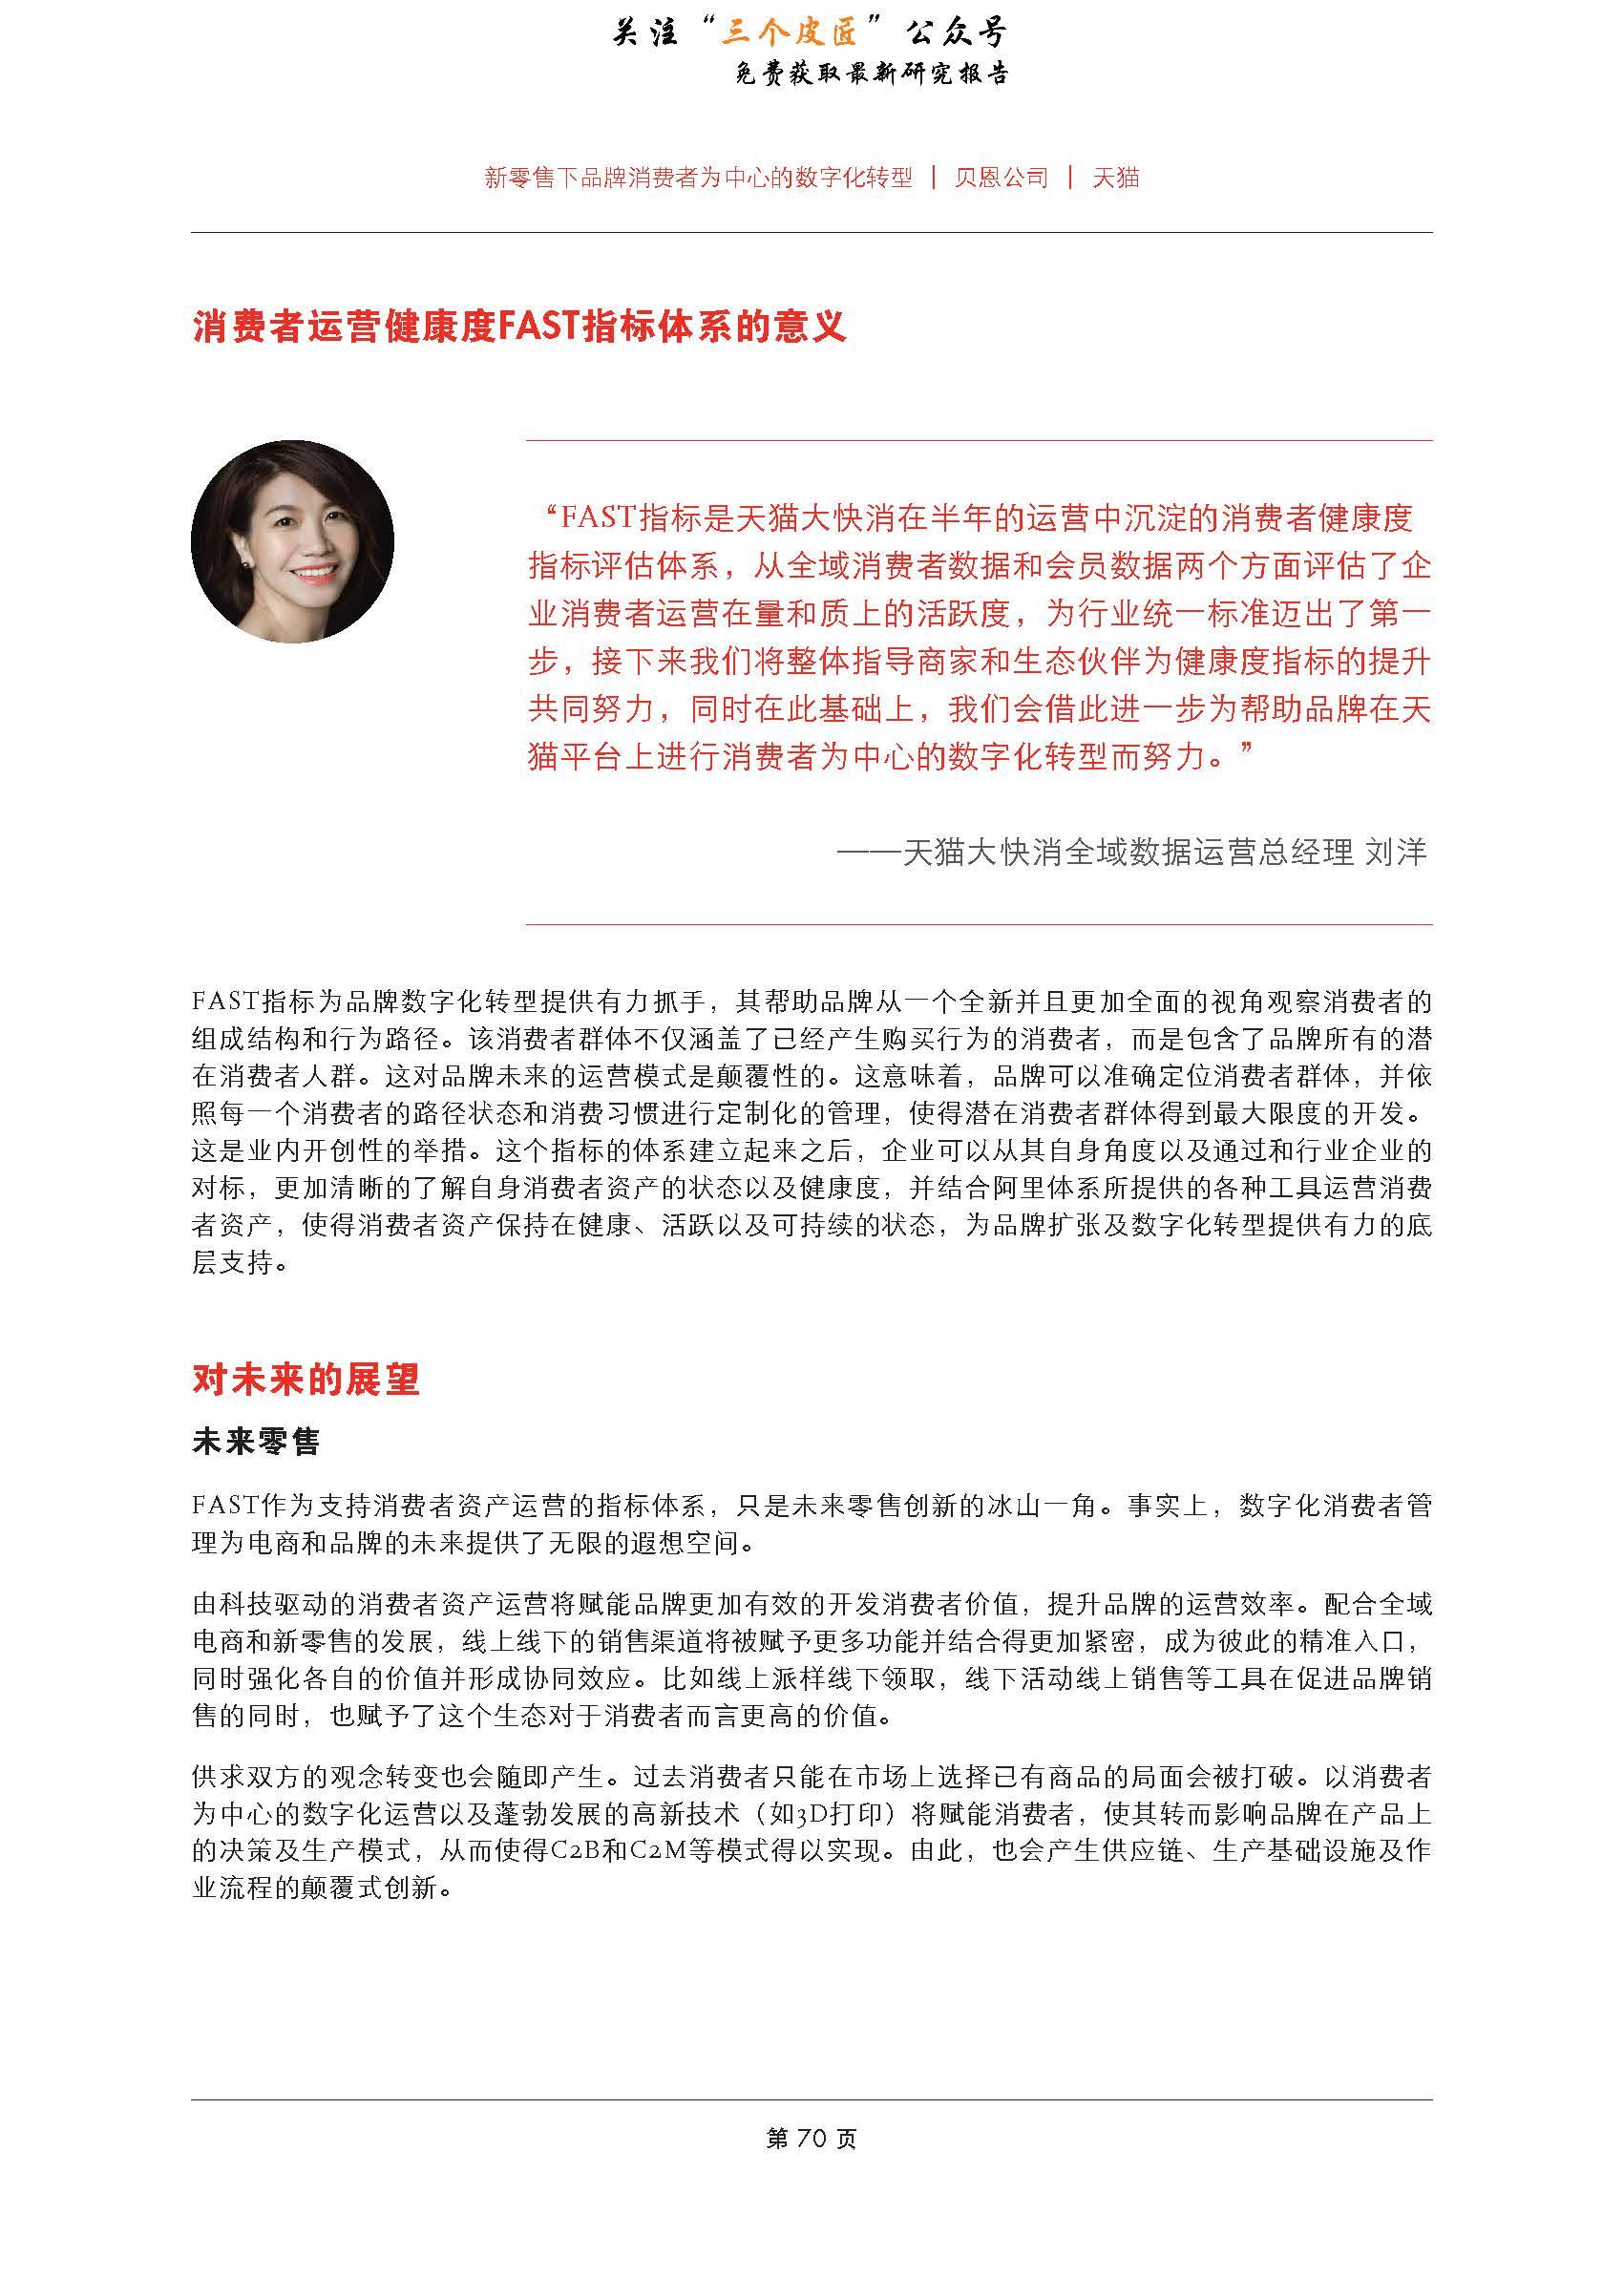 1_Page_72.jpg